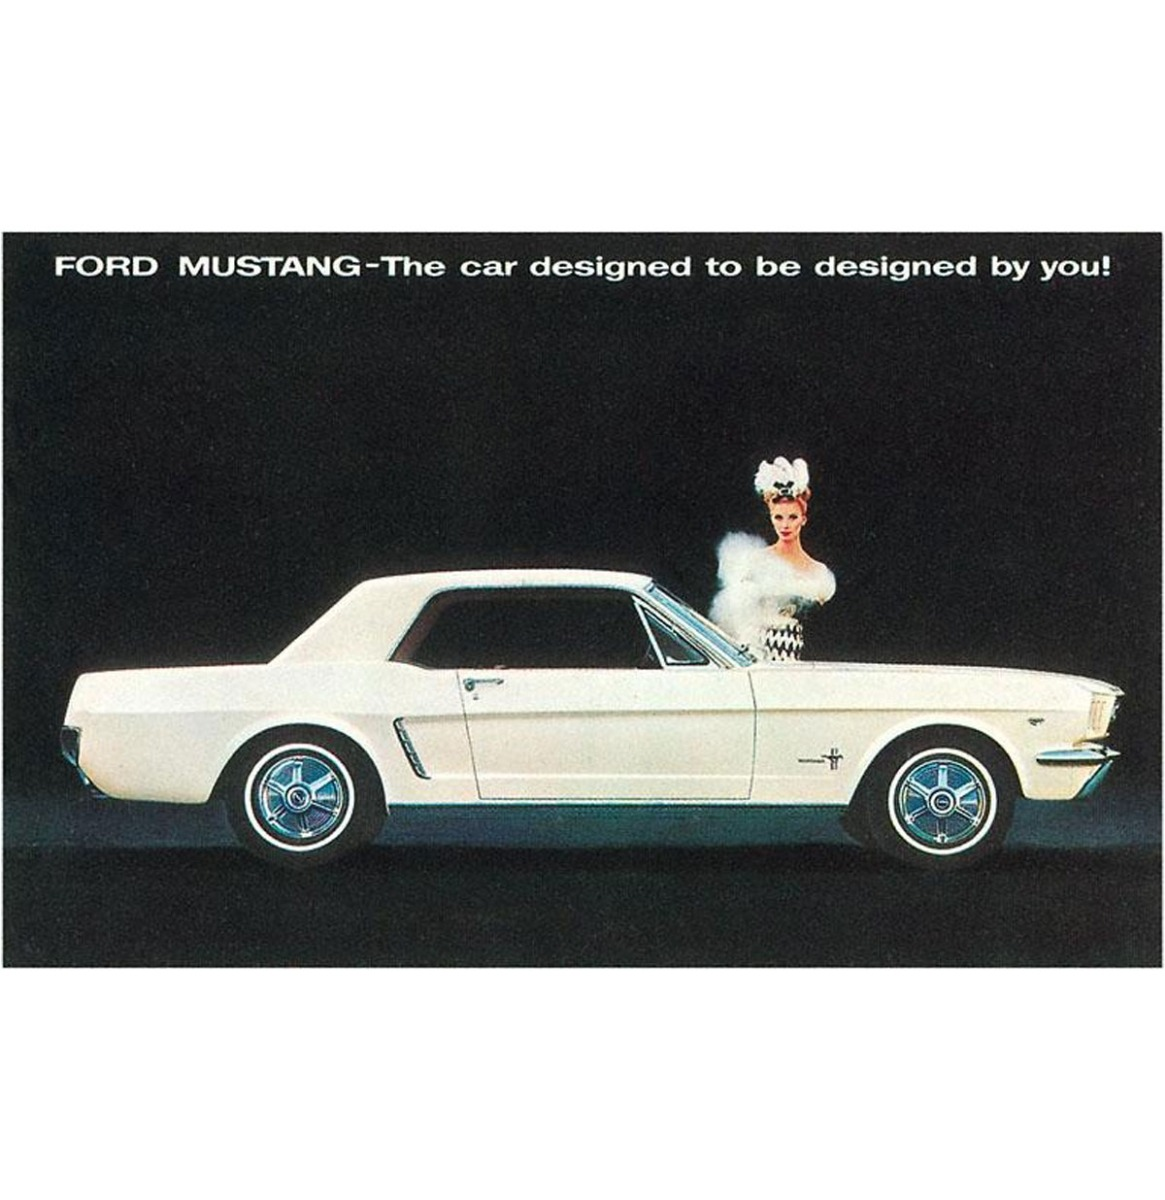 Mustang - Vintage Foto, Kunst Afdruk